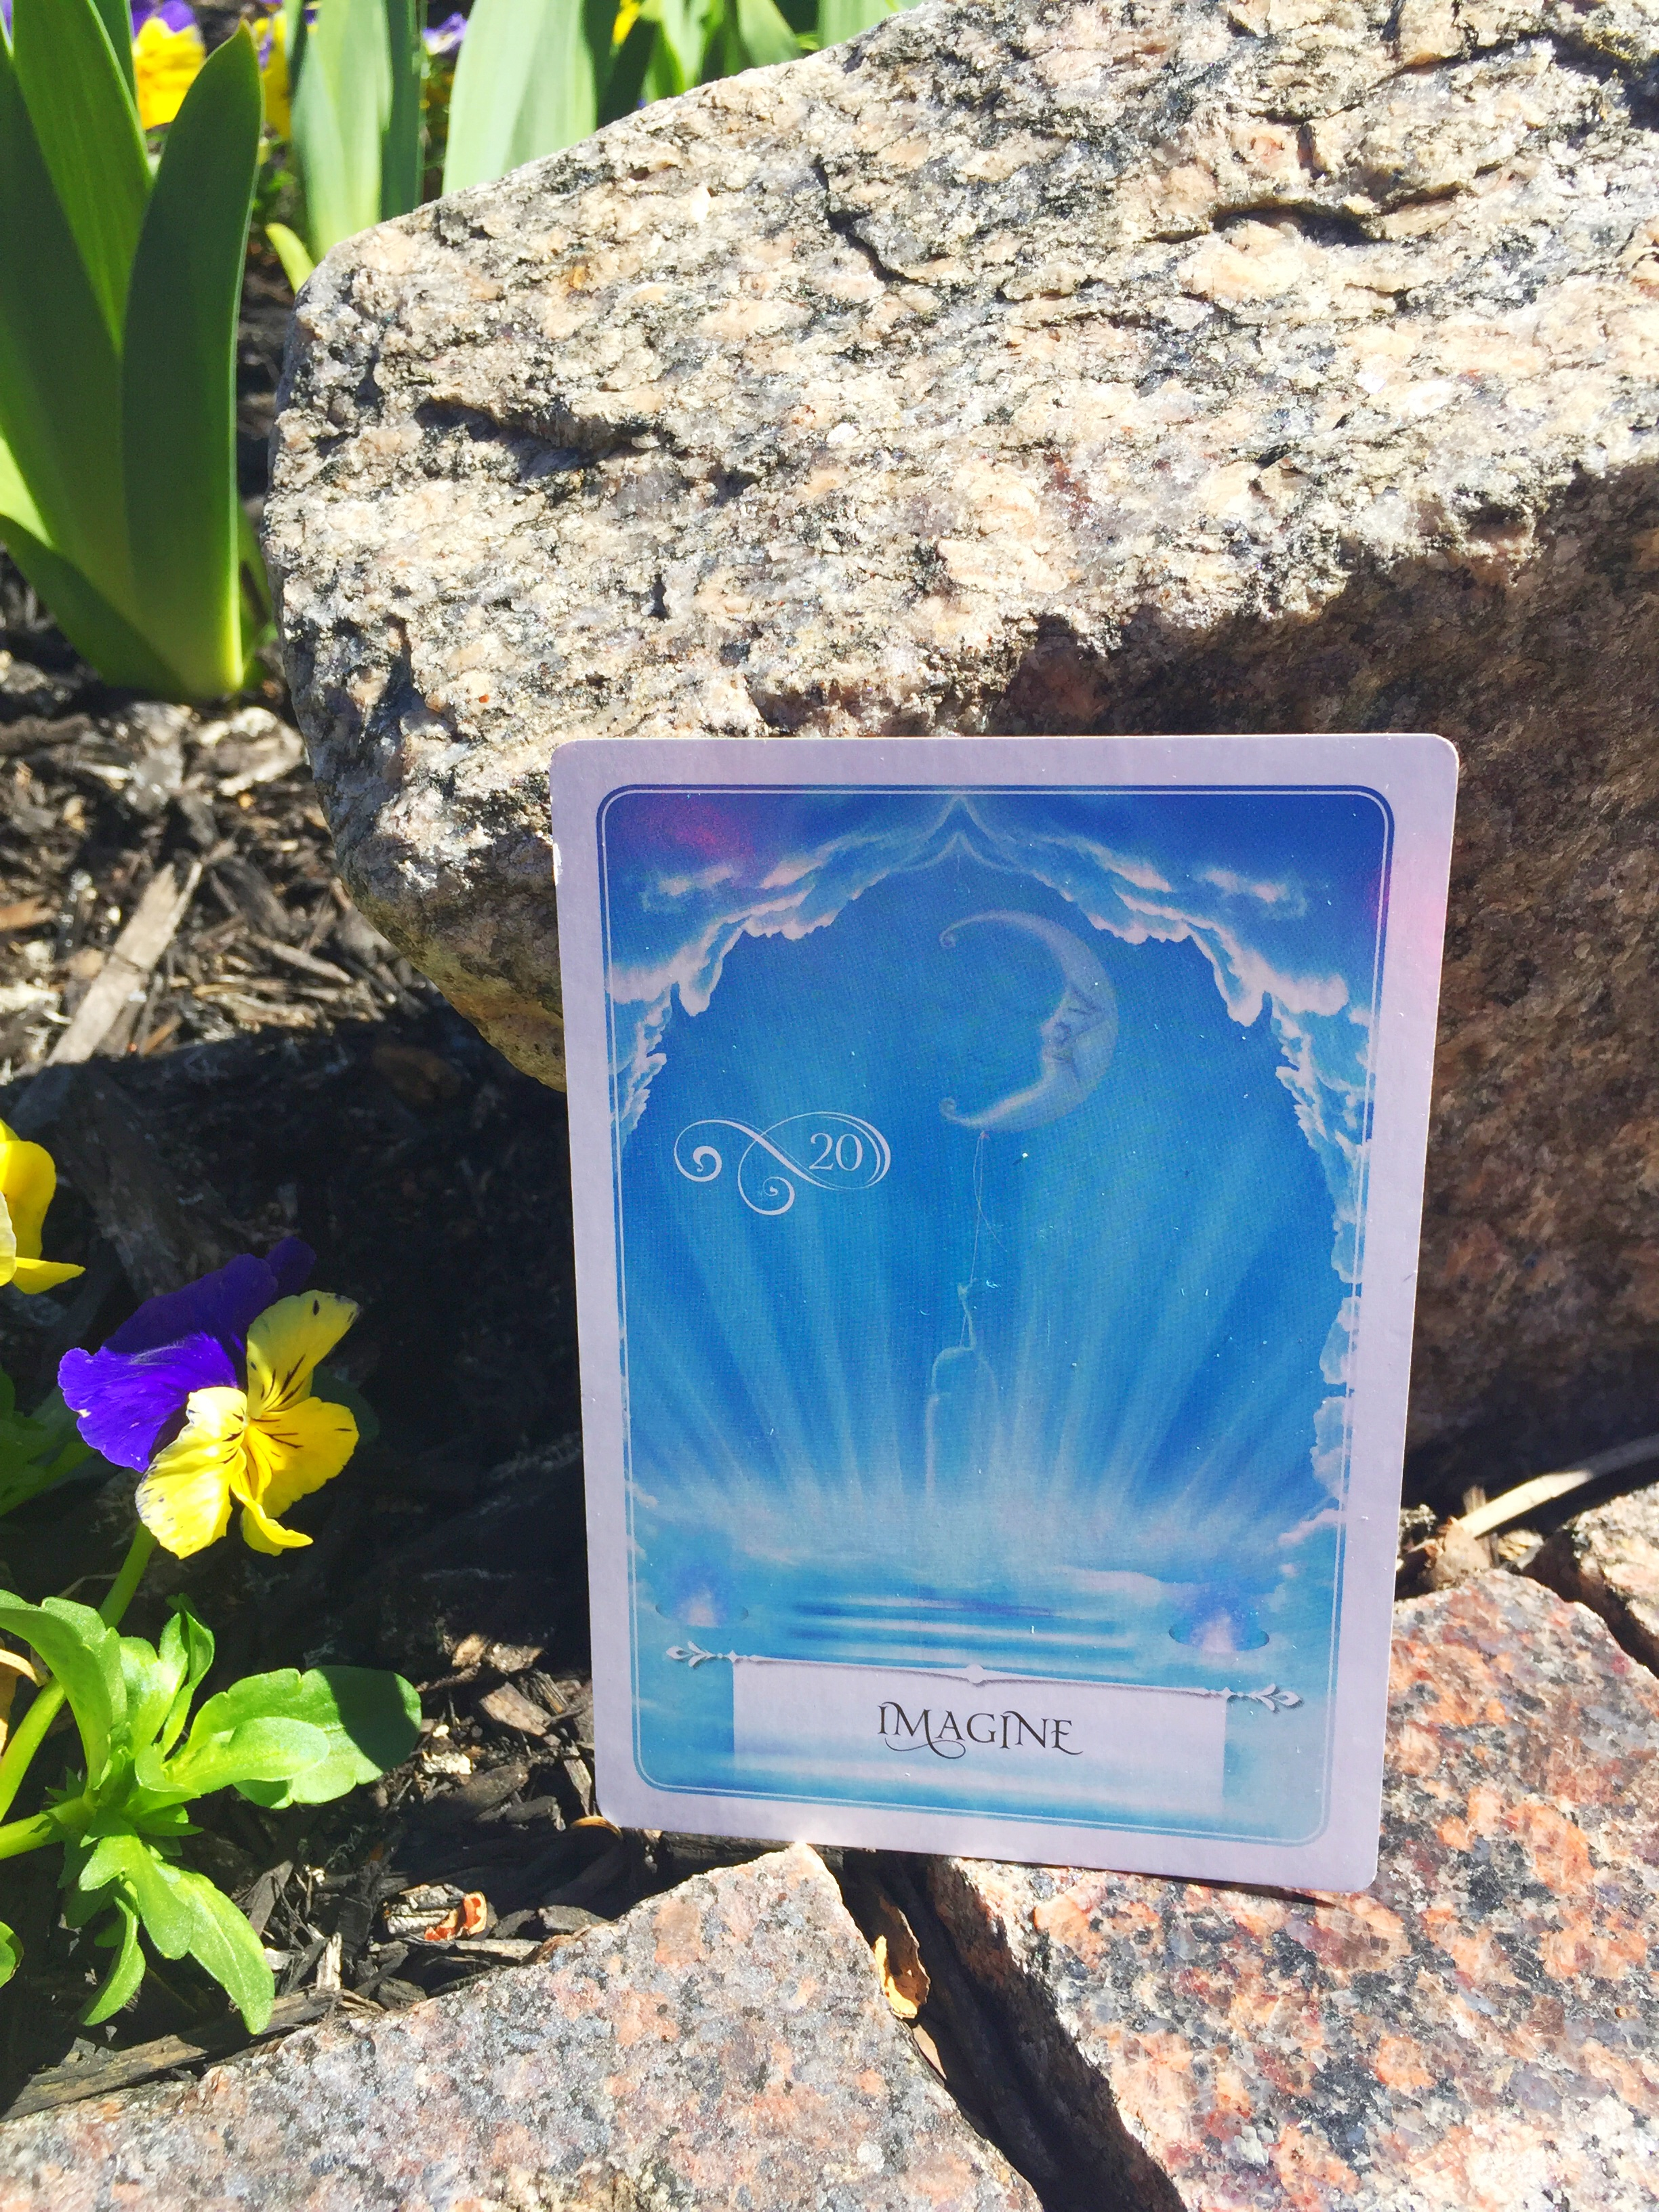 Imagine (Wisdom of the Oracle, Hay House Publishing)